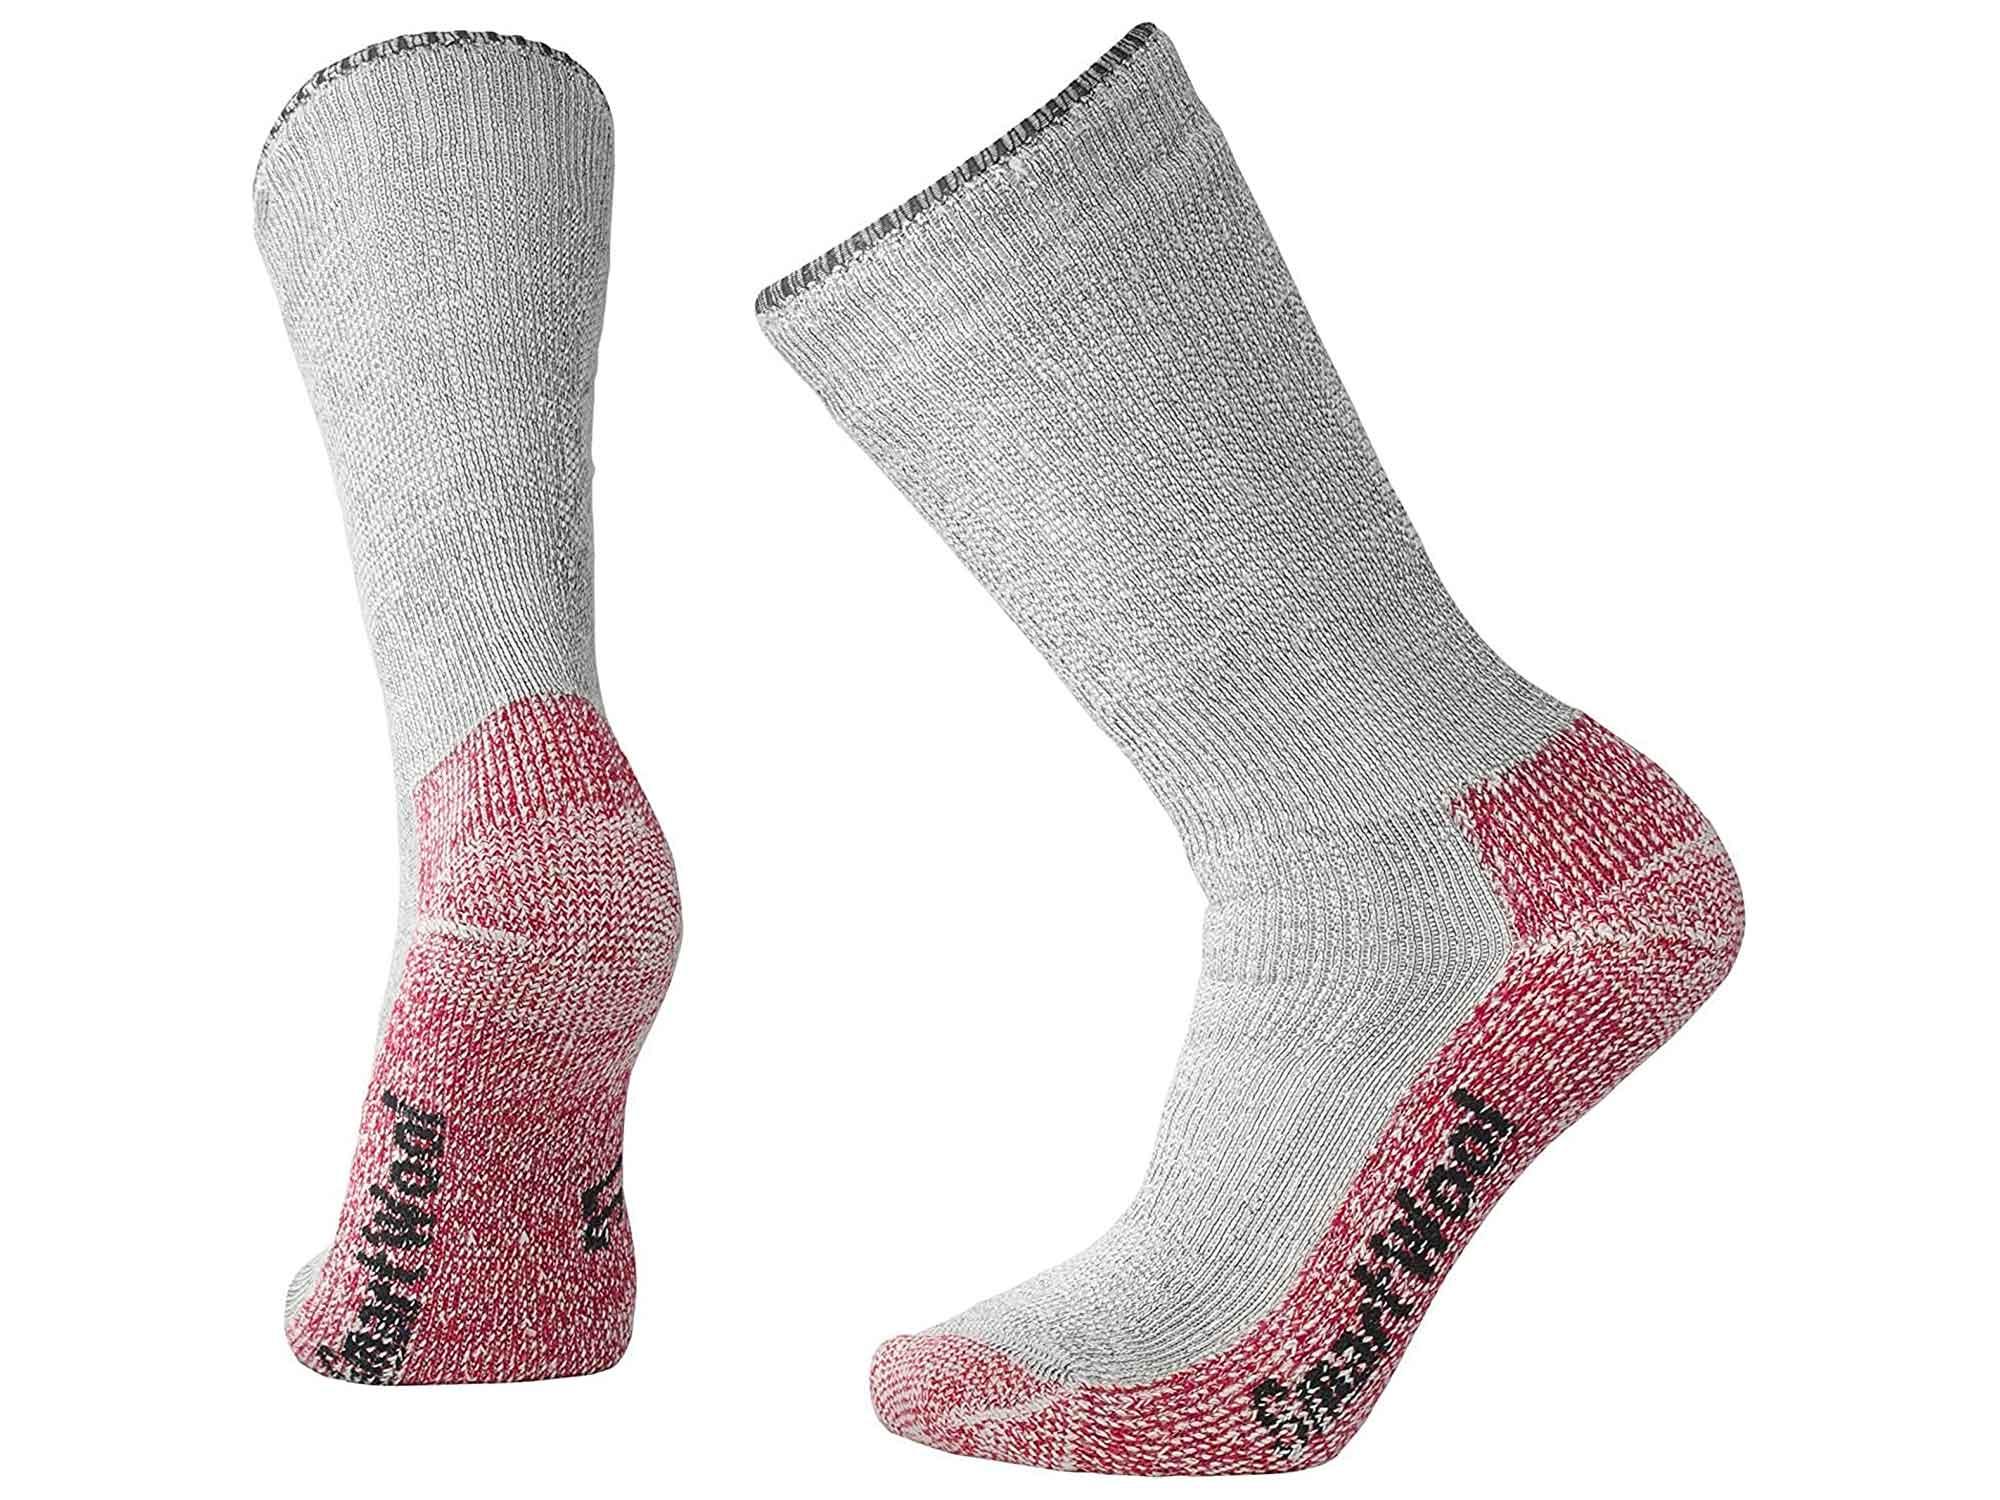 Smartwool Mountaineering Crew Socks are the best warm socks for men